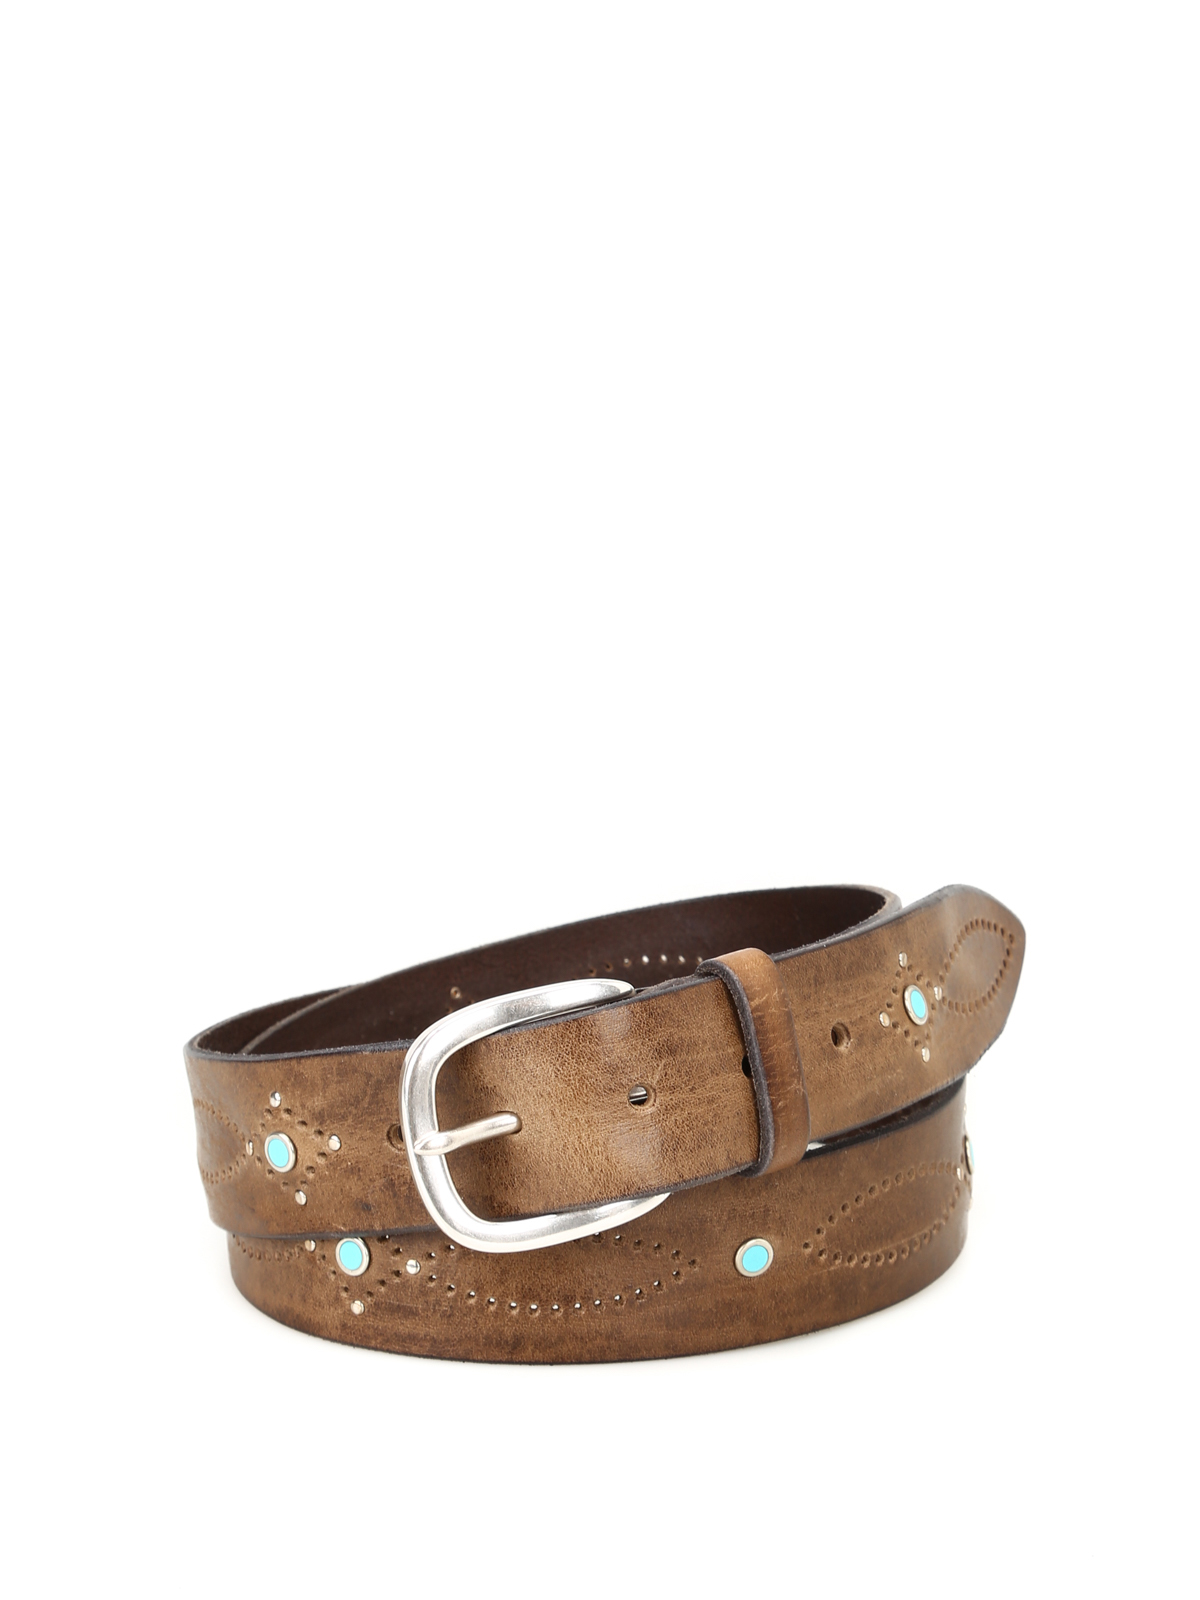 Tan leather belt Orciani 7Dv2qWji